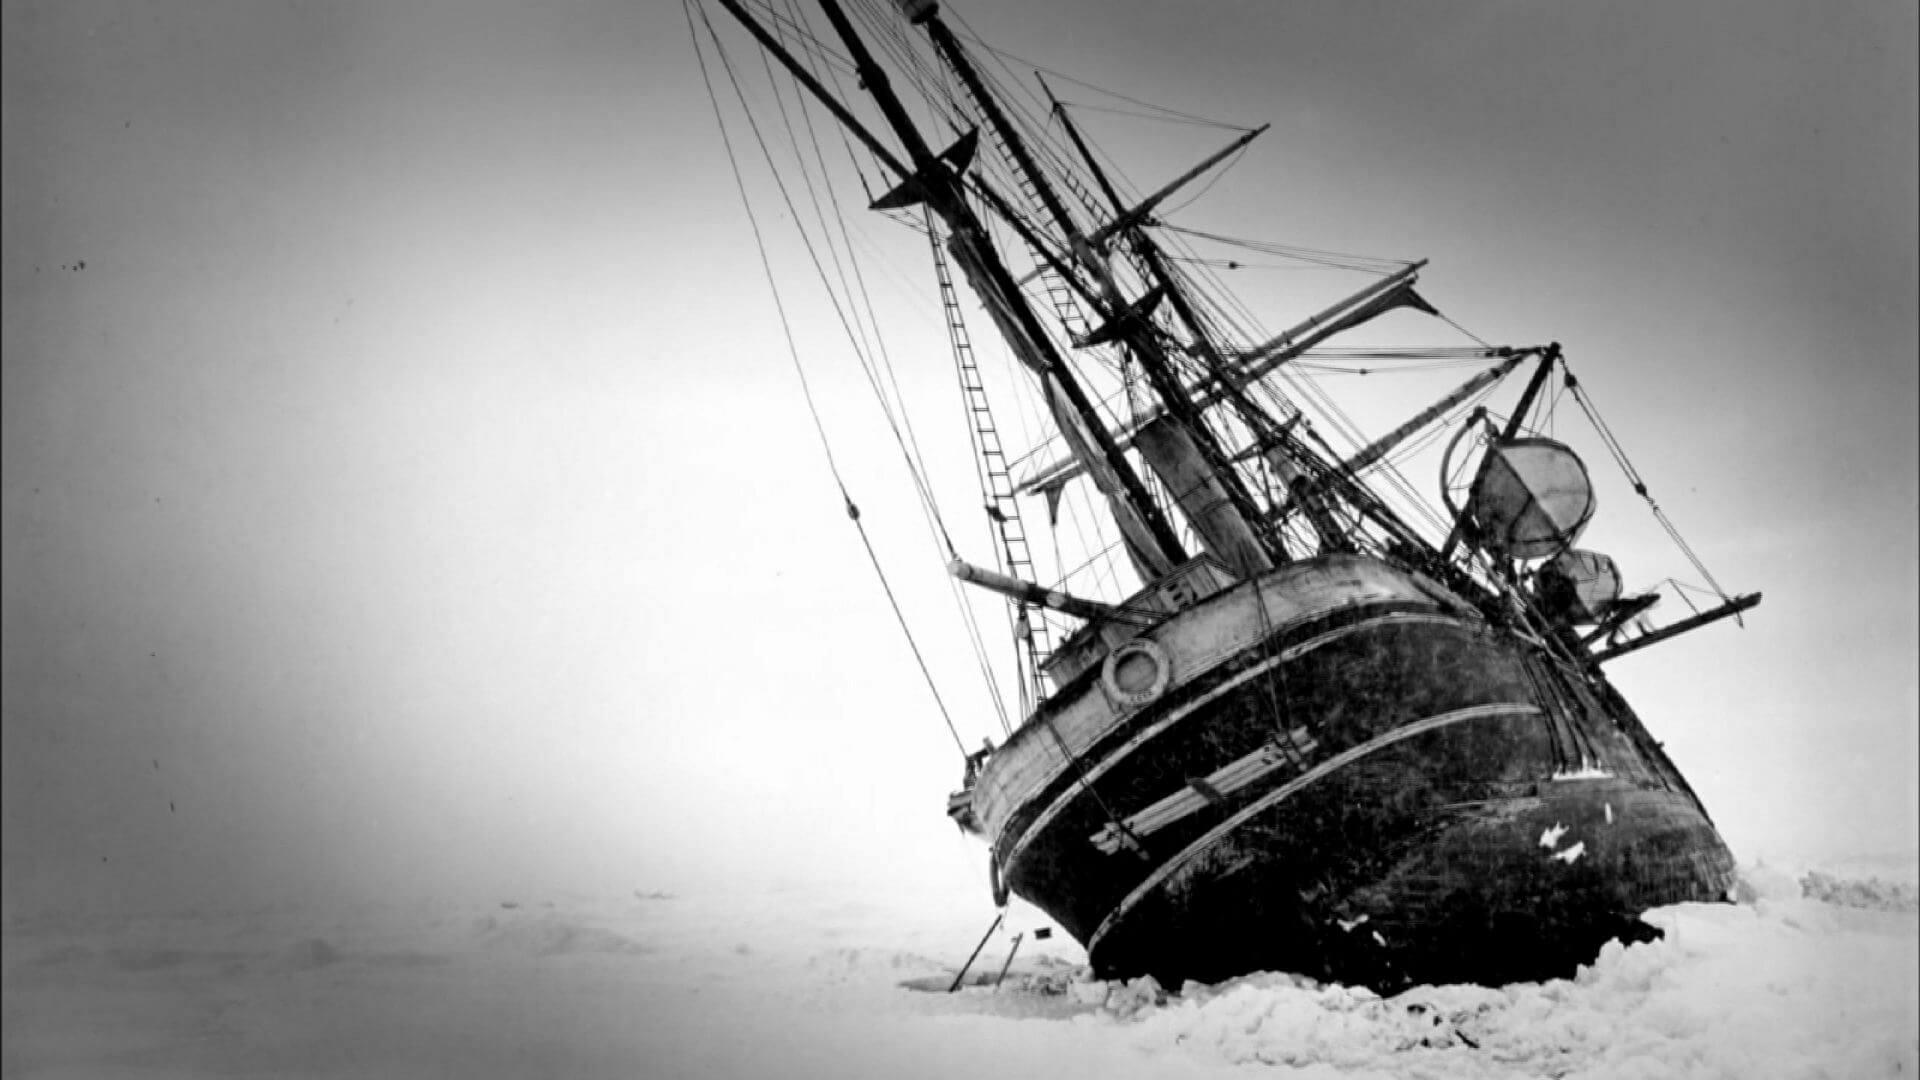 shackletons lost ship endurance - HD1920×1080